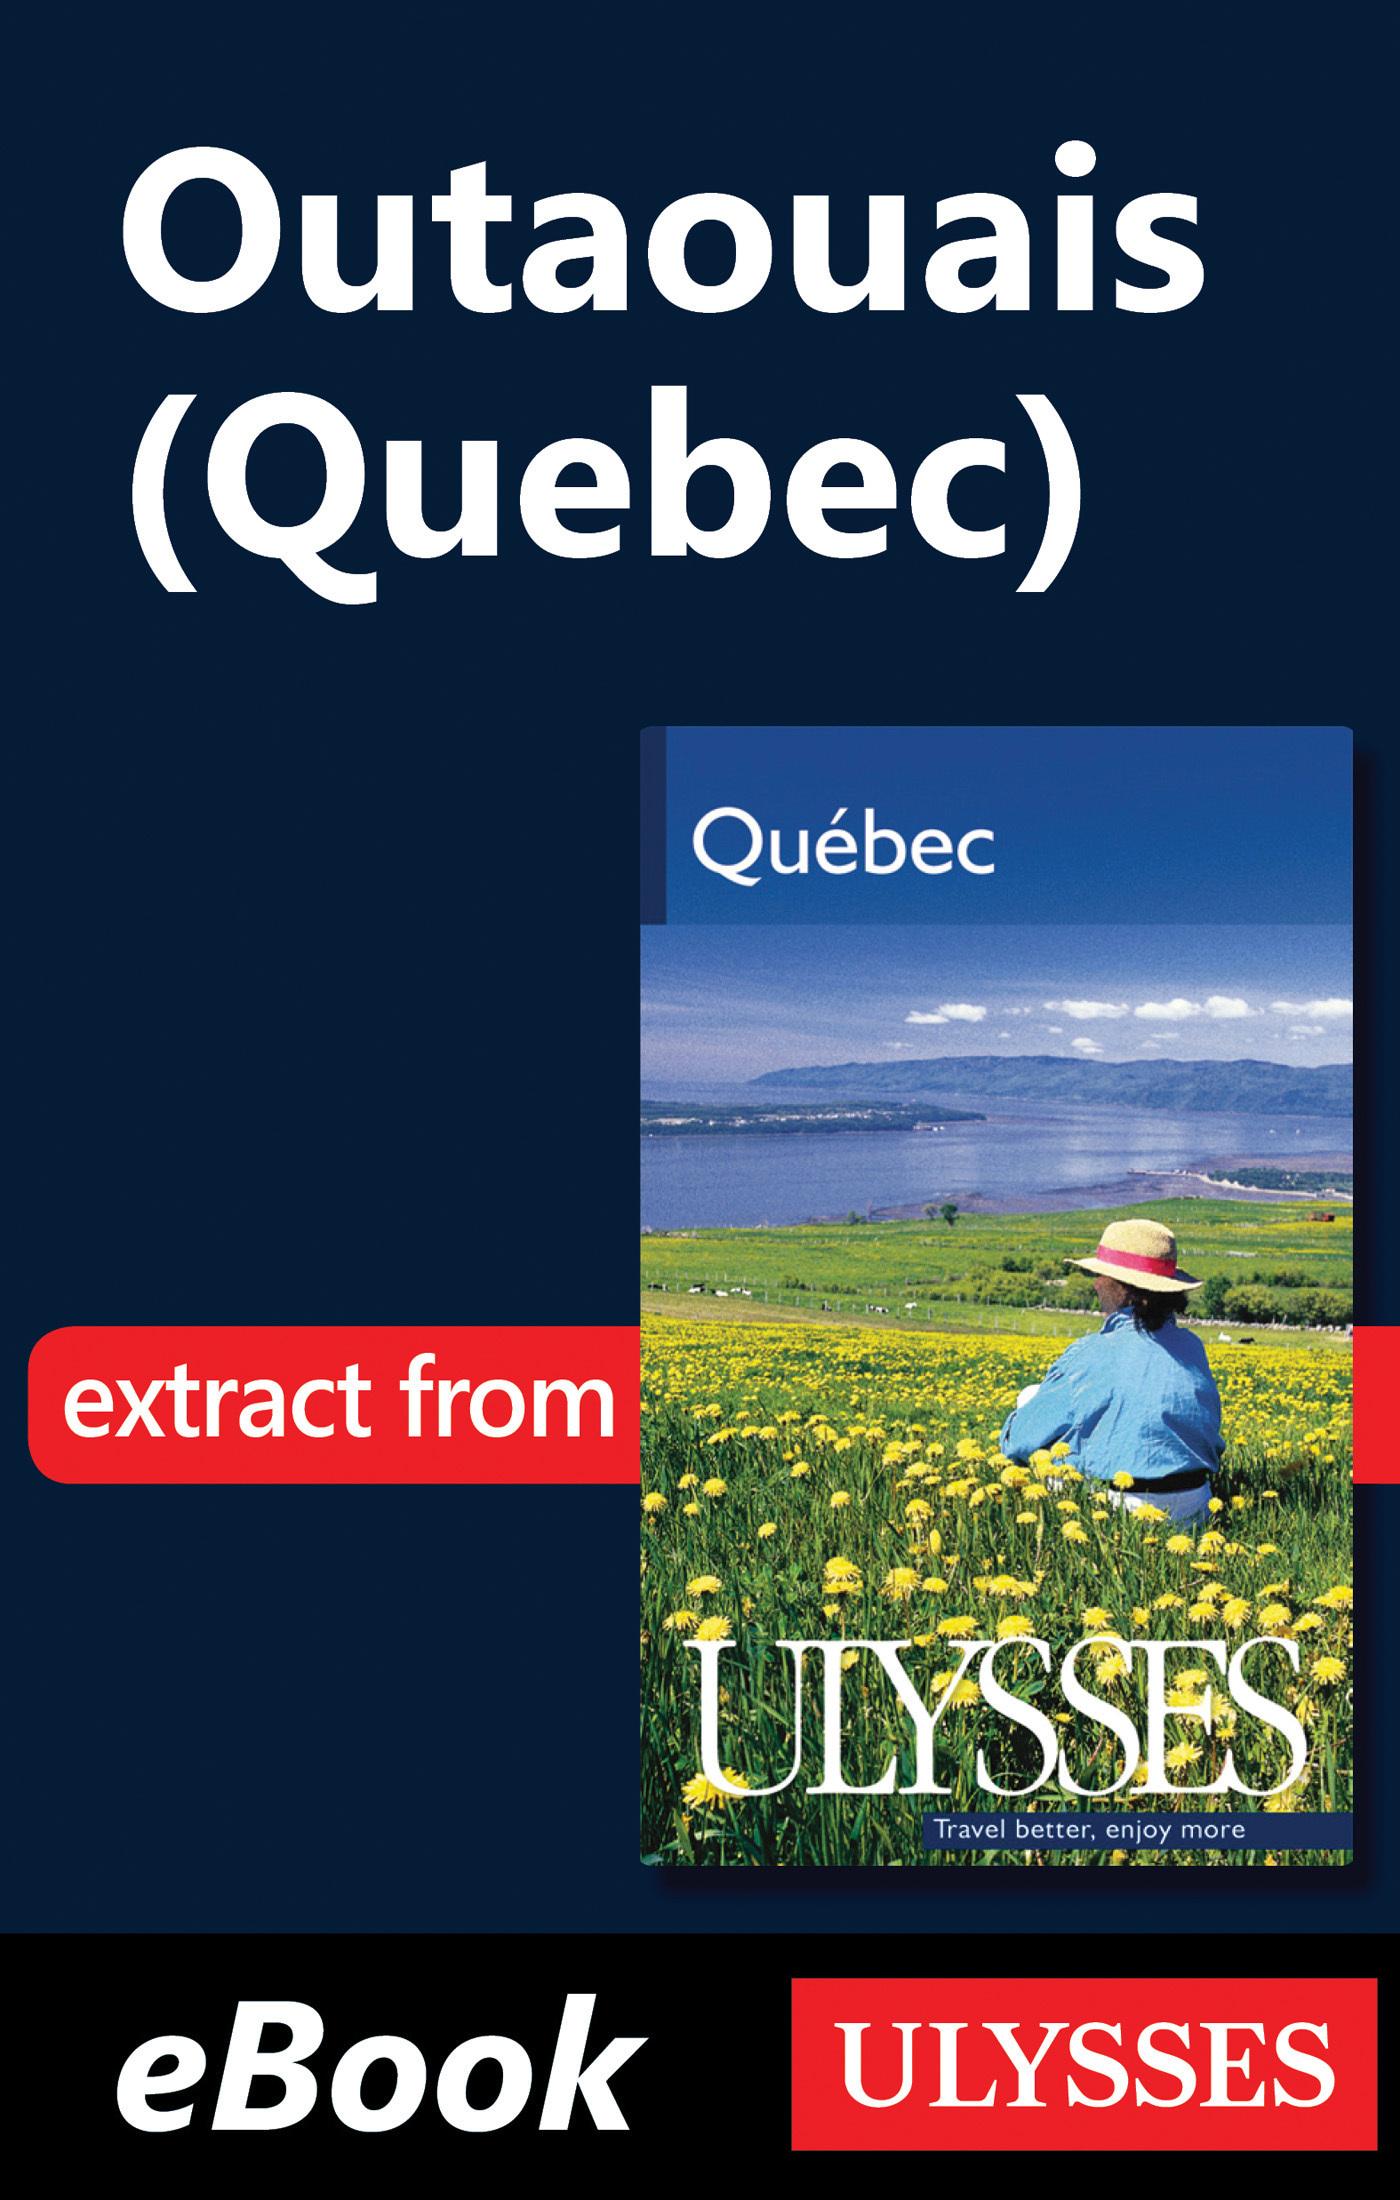 Outaouais - Québec